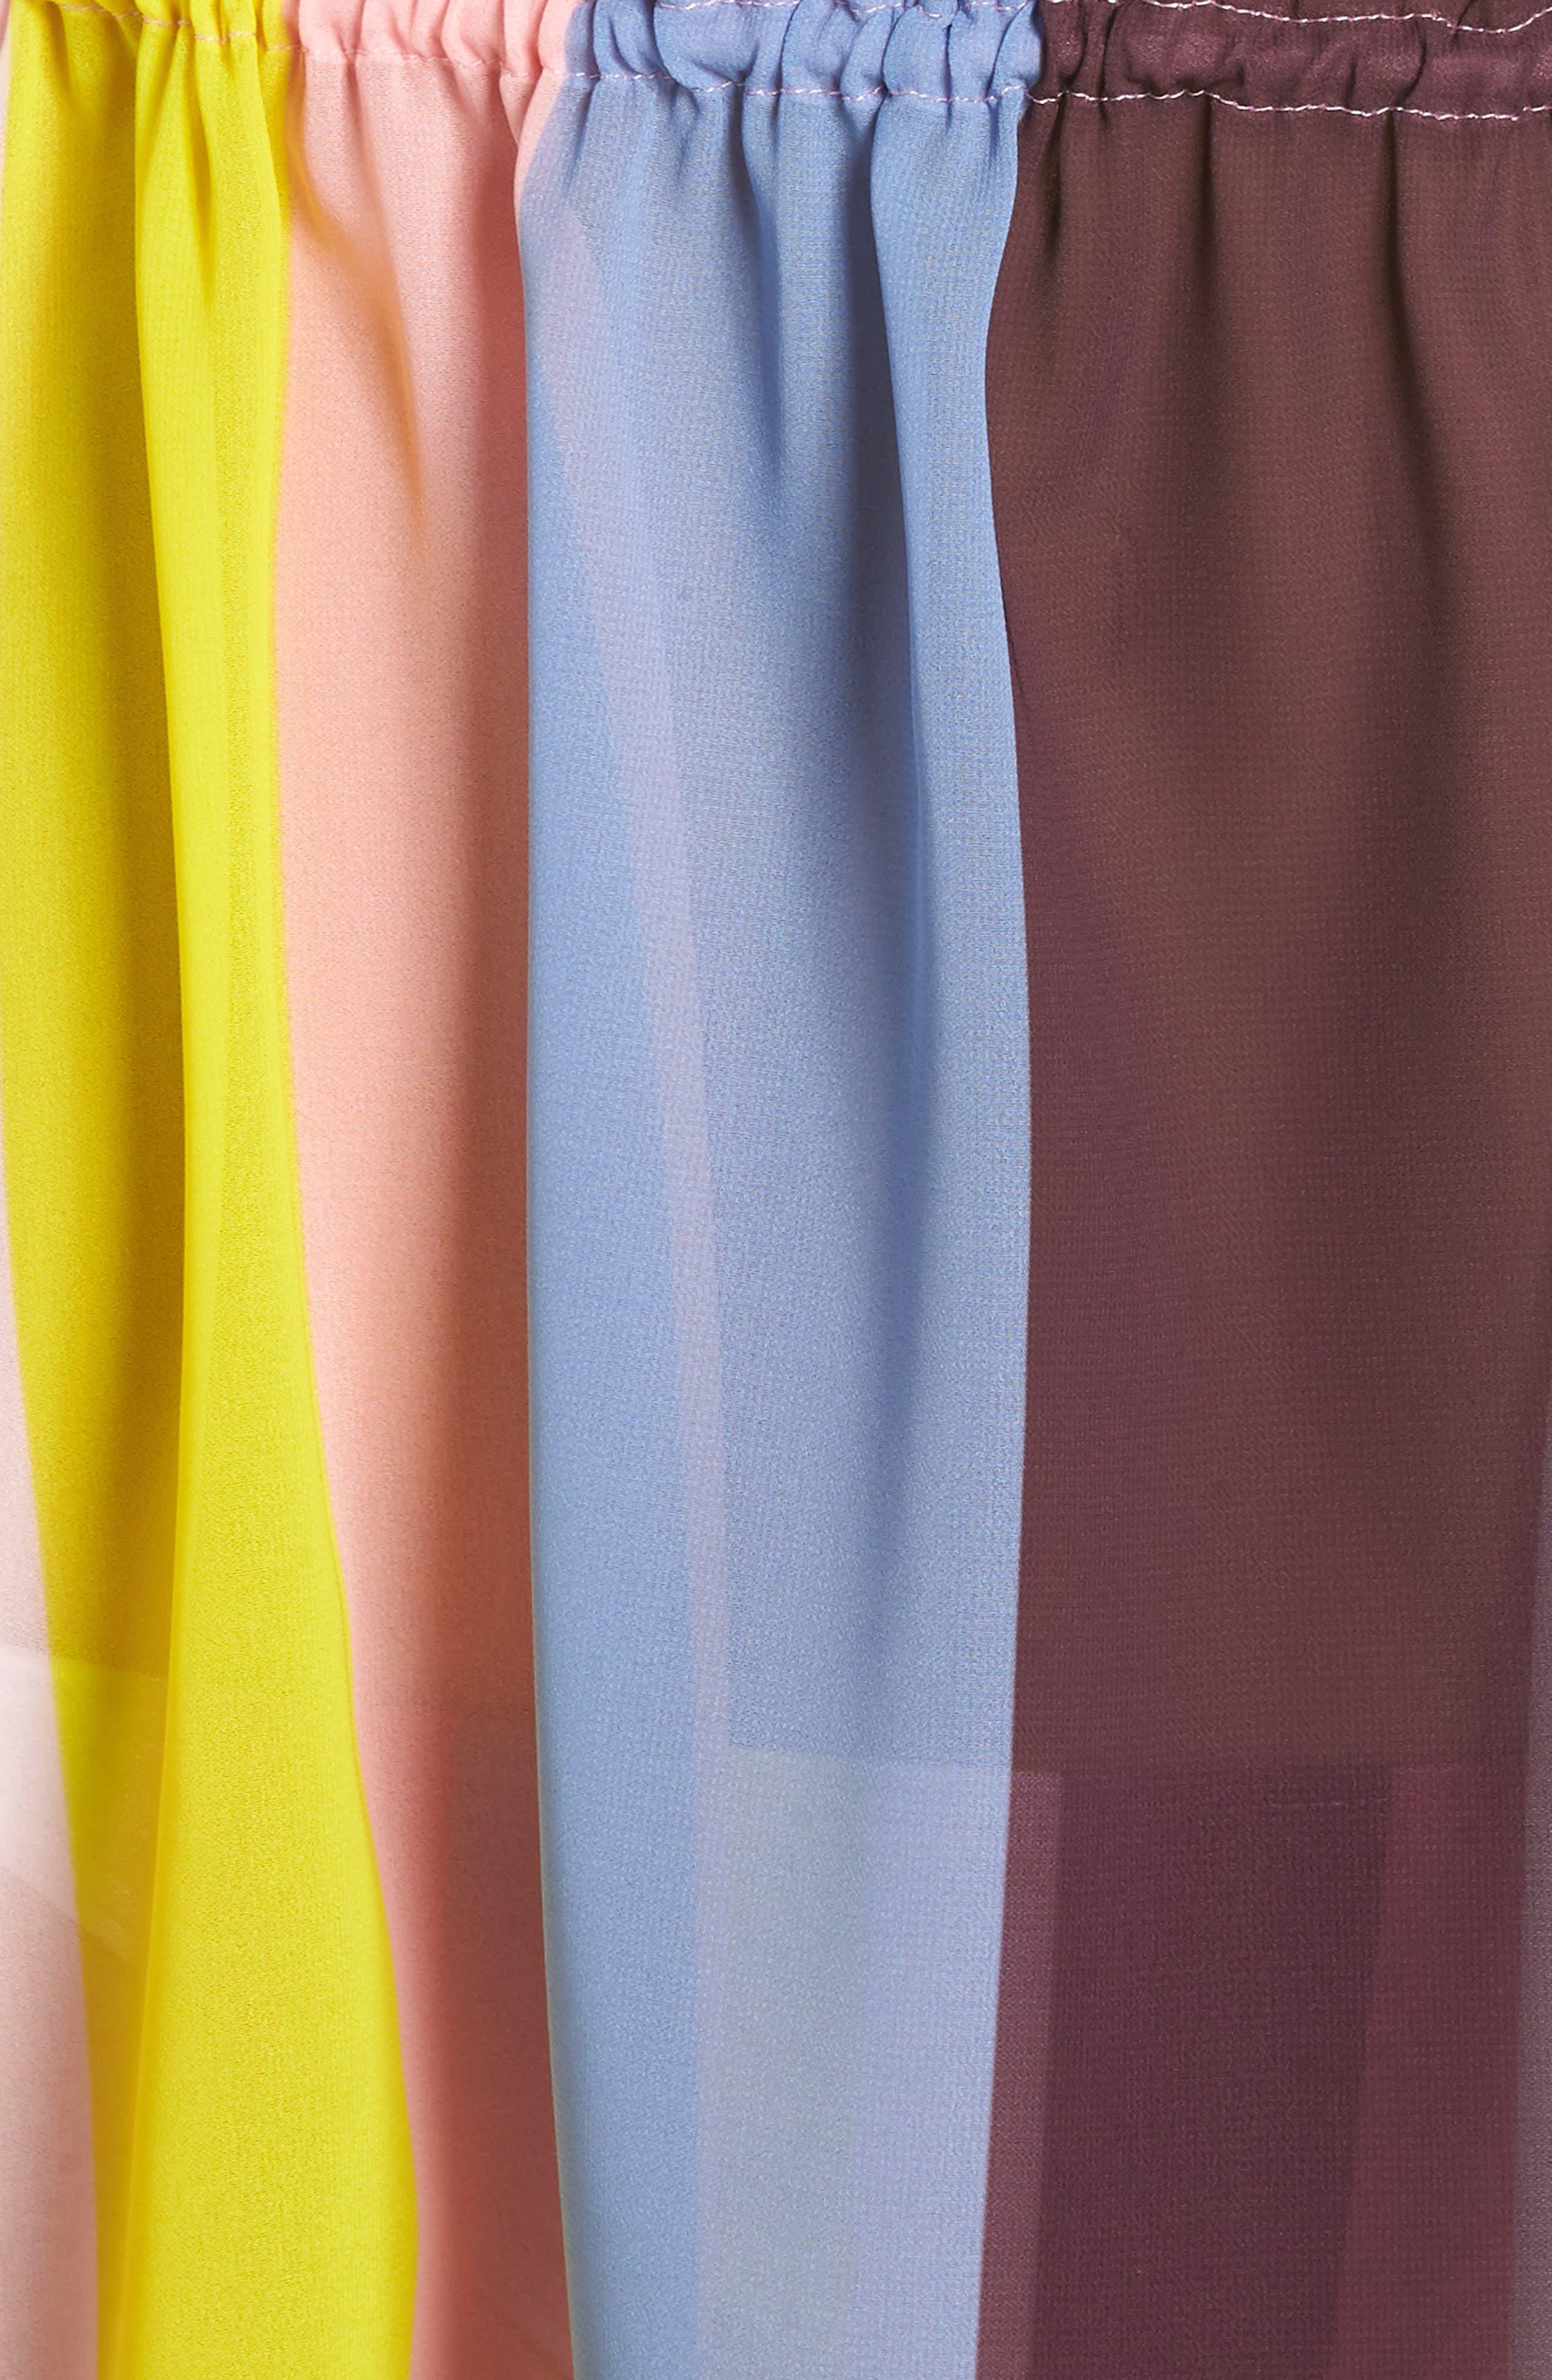 Penaree Rio Stripe Tabbard Cover-Up,                             Alternate thumbnail 5, color,                             LIGHT PINK